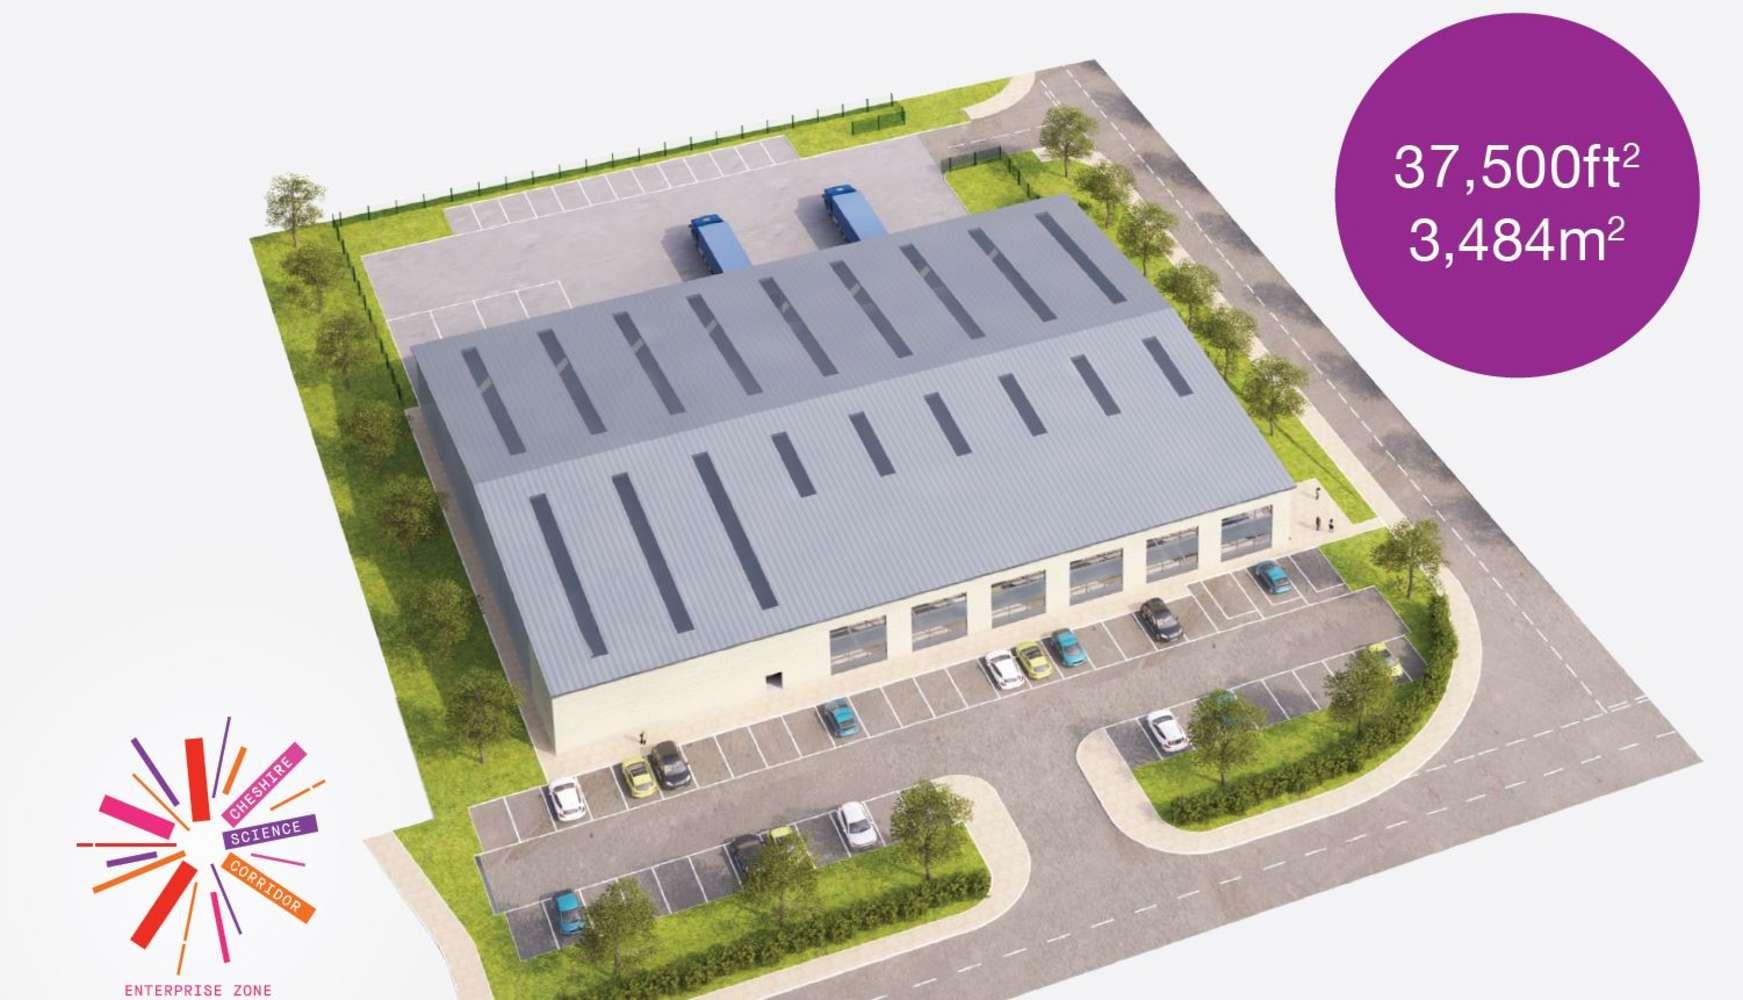 Industrial and logistics Warrington, WA3 6WU - 721, Cavendish Avenue - 721